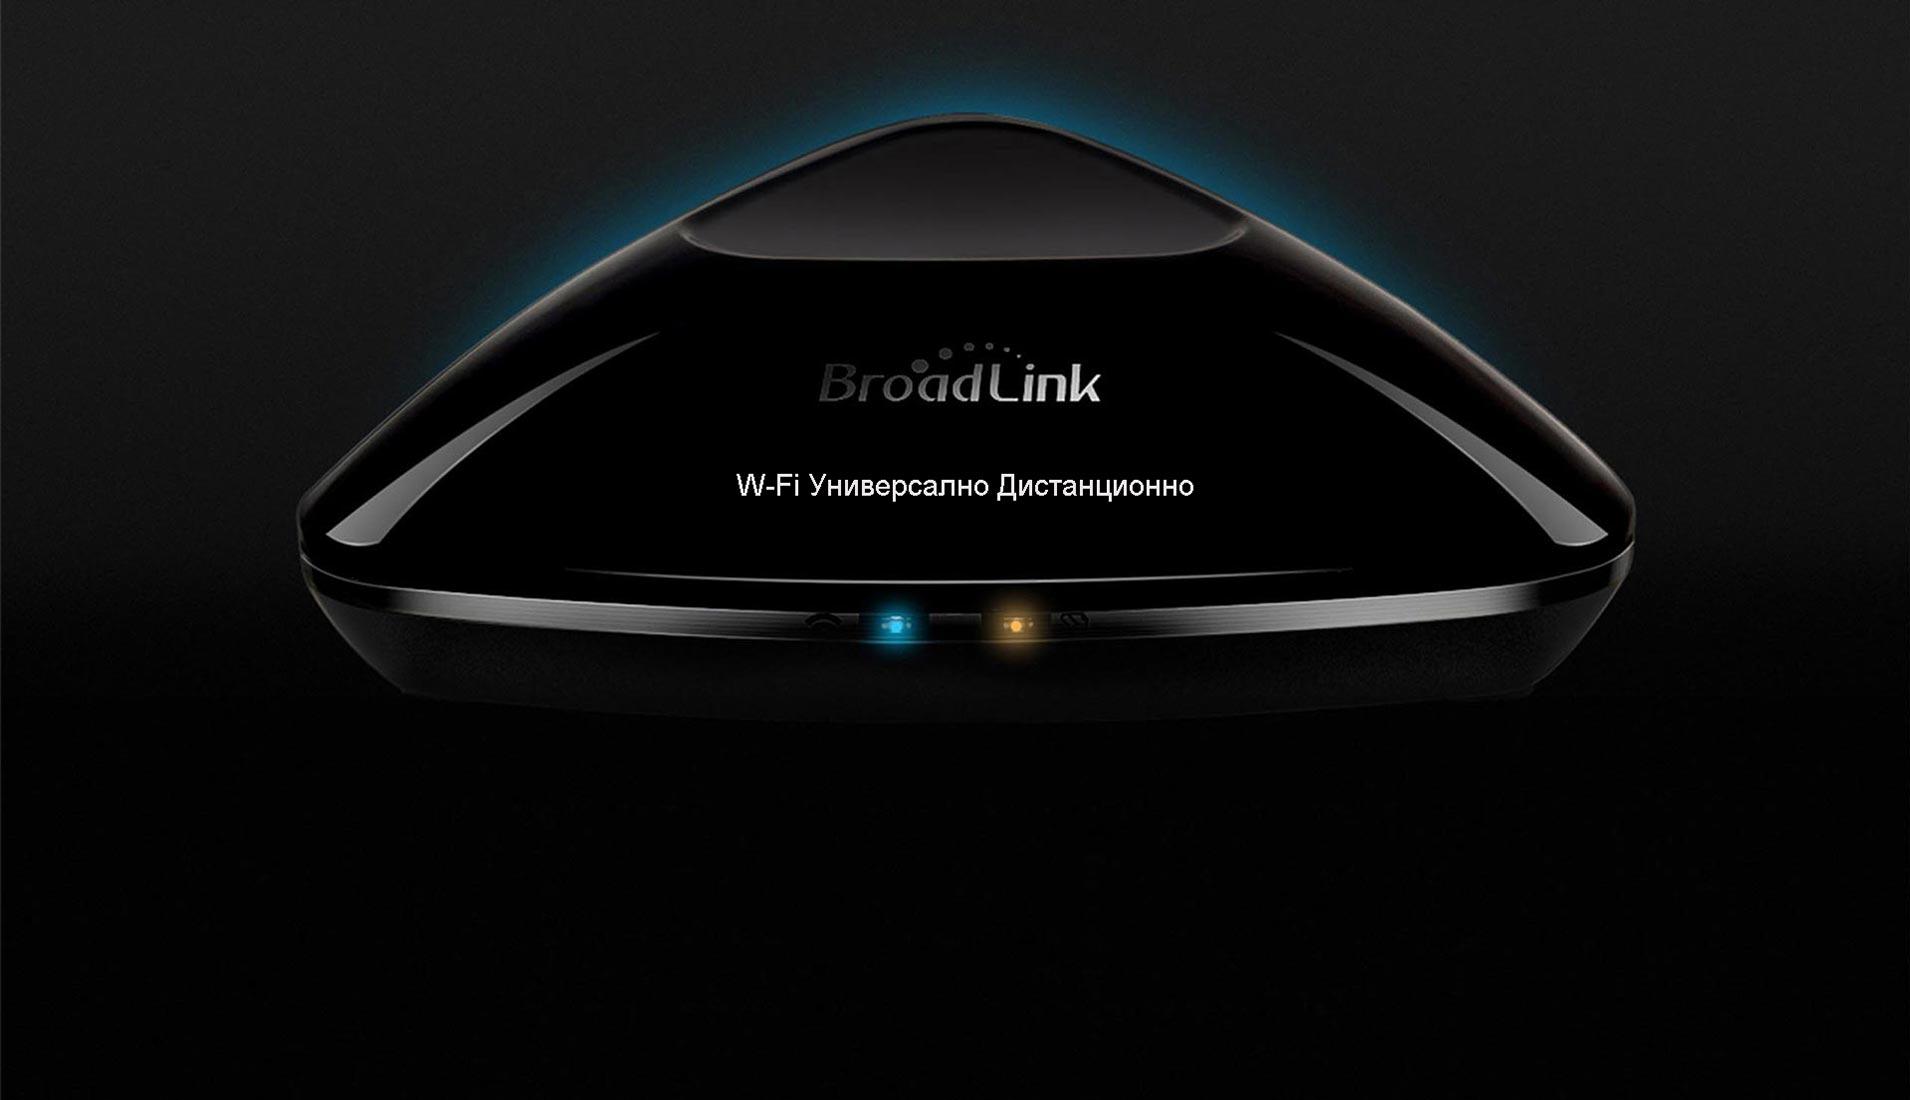 BroadLink RM PRO - WiFi Универсално Дистанционно